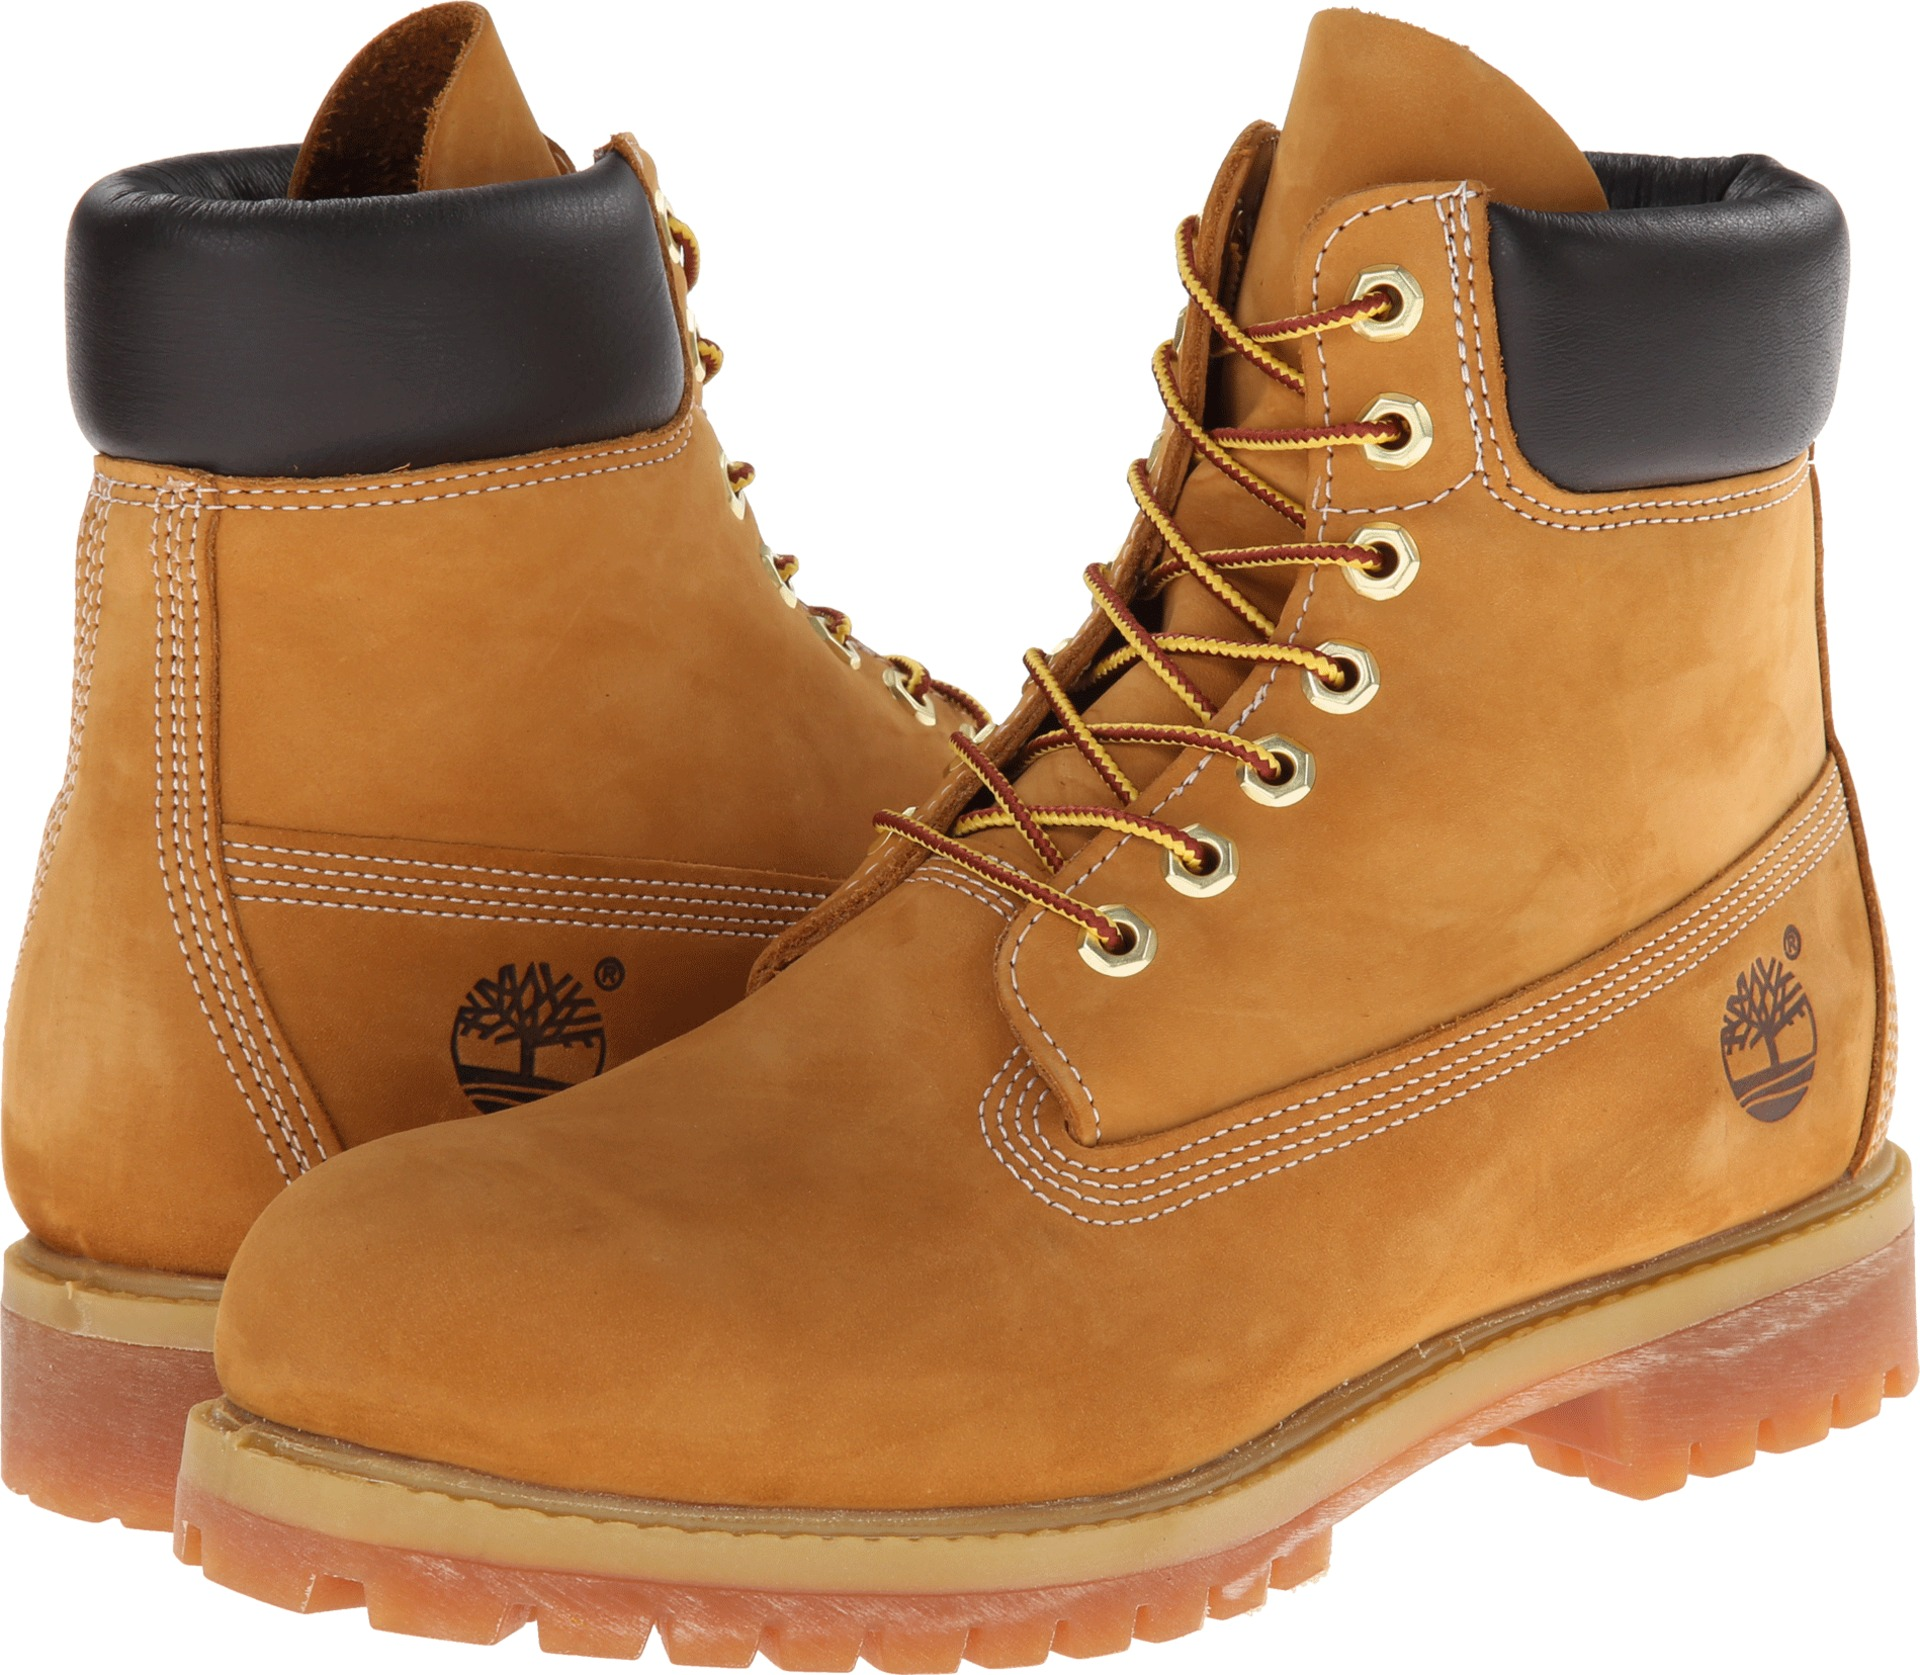 "Timberland classic 6"" premium boot wheat nubuck leather"